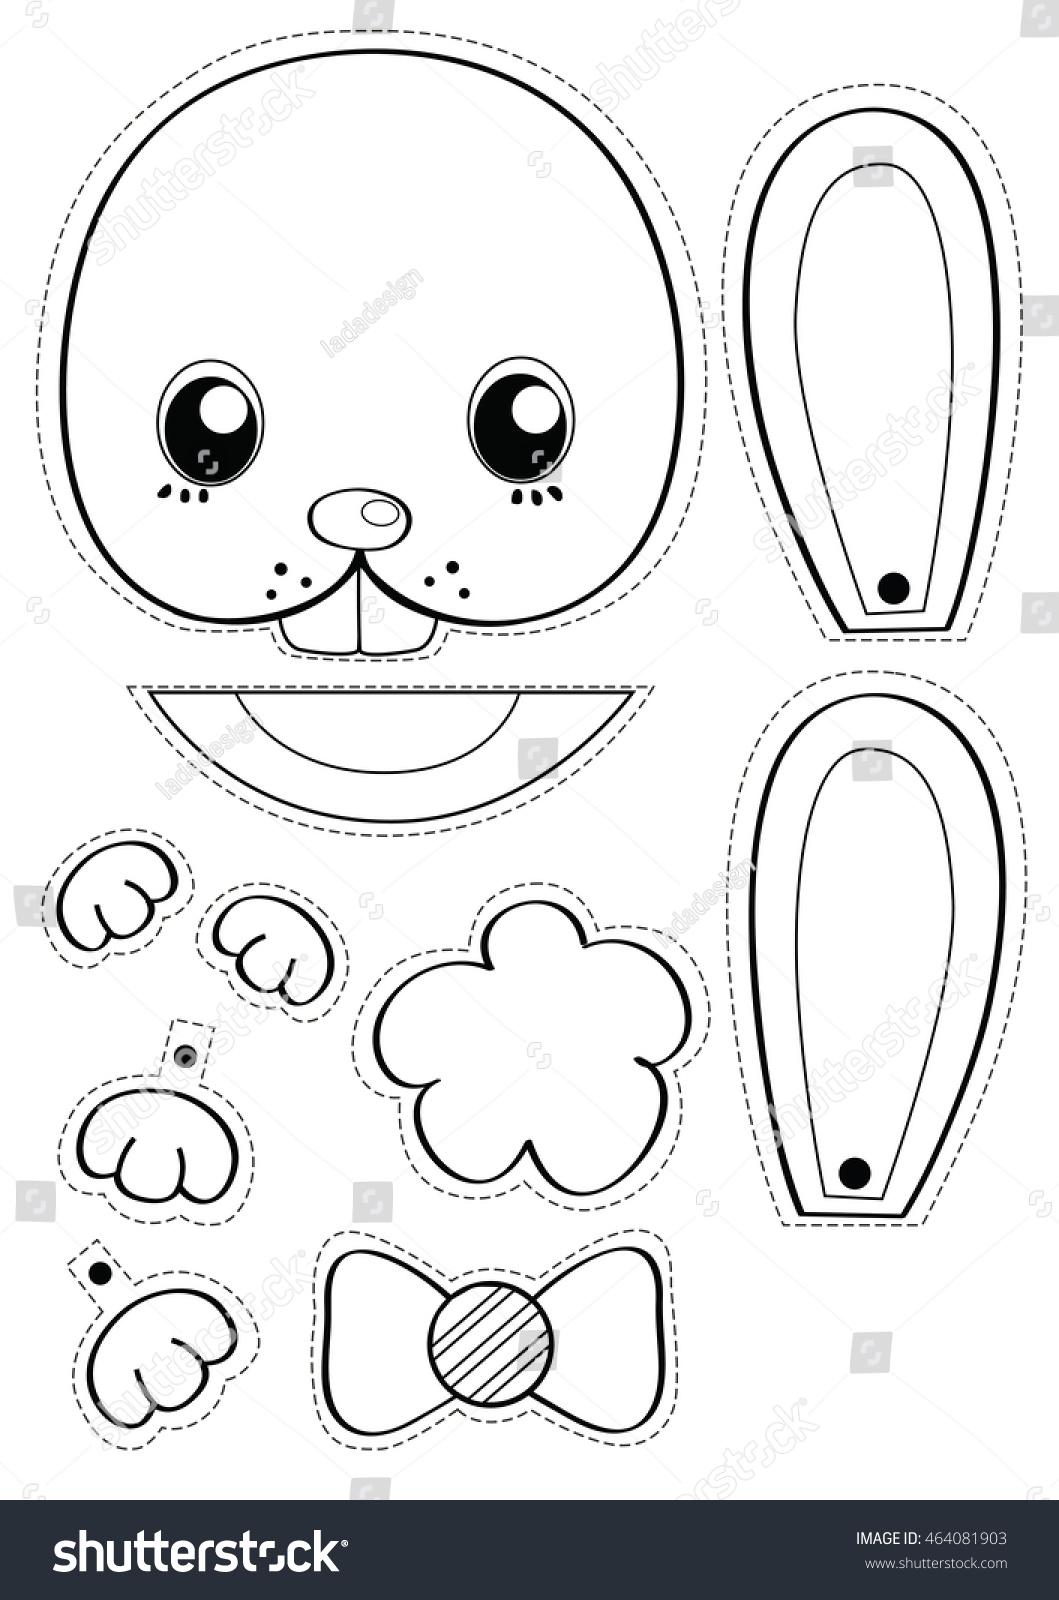 Rabbit Black White Cartoon Painting Cut Stock Illustration